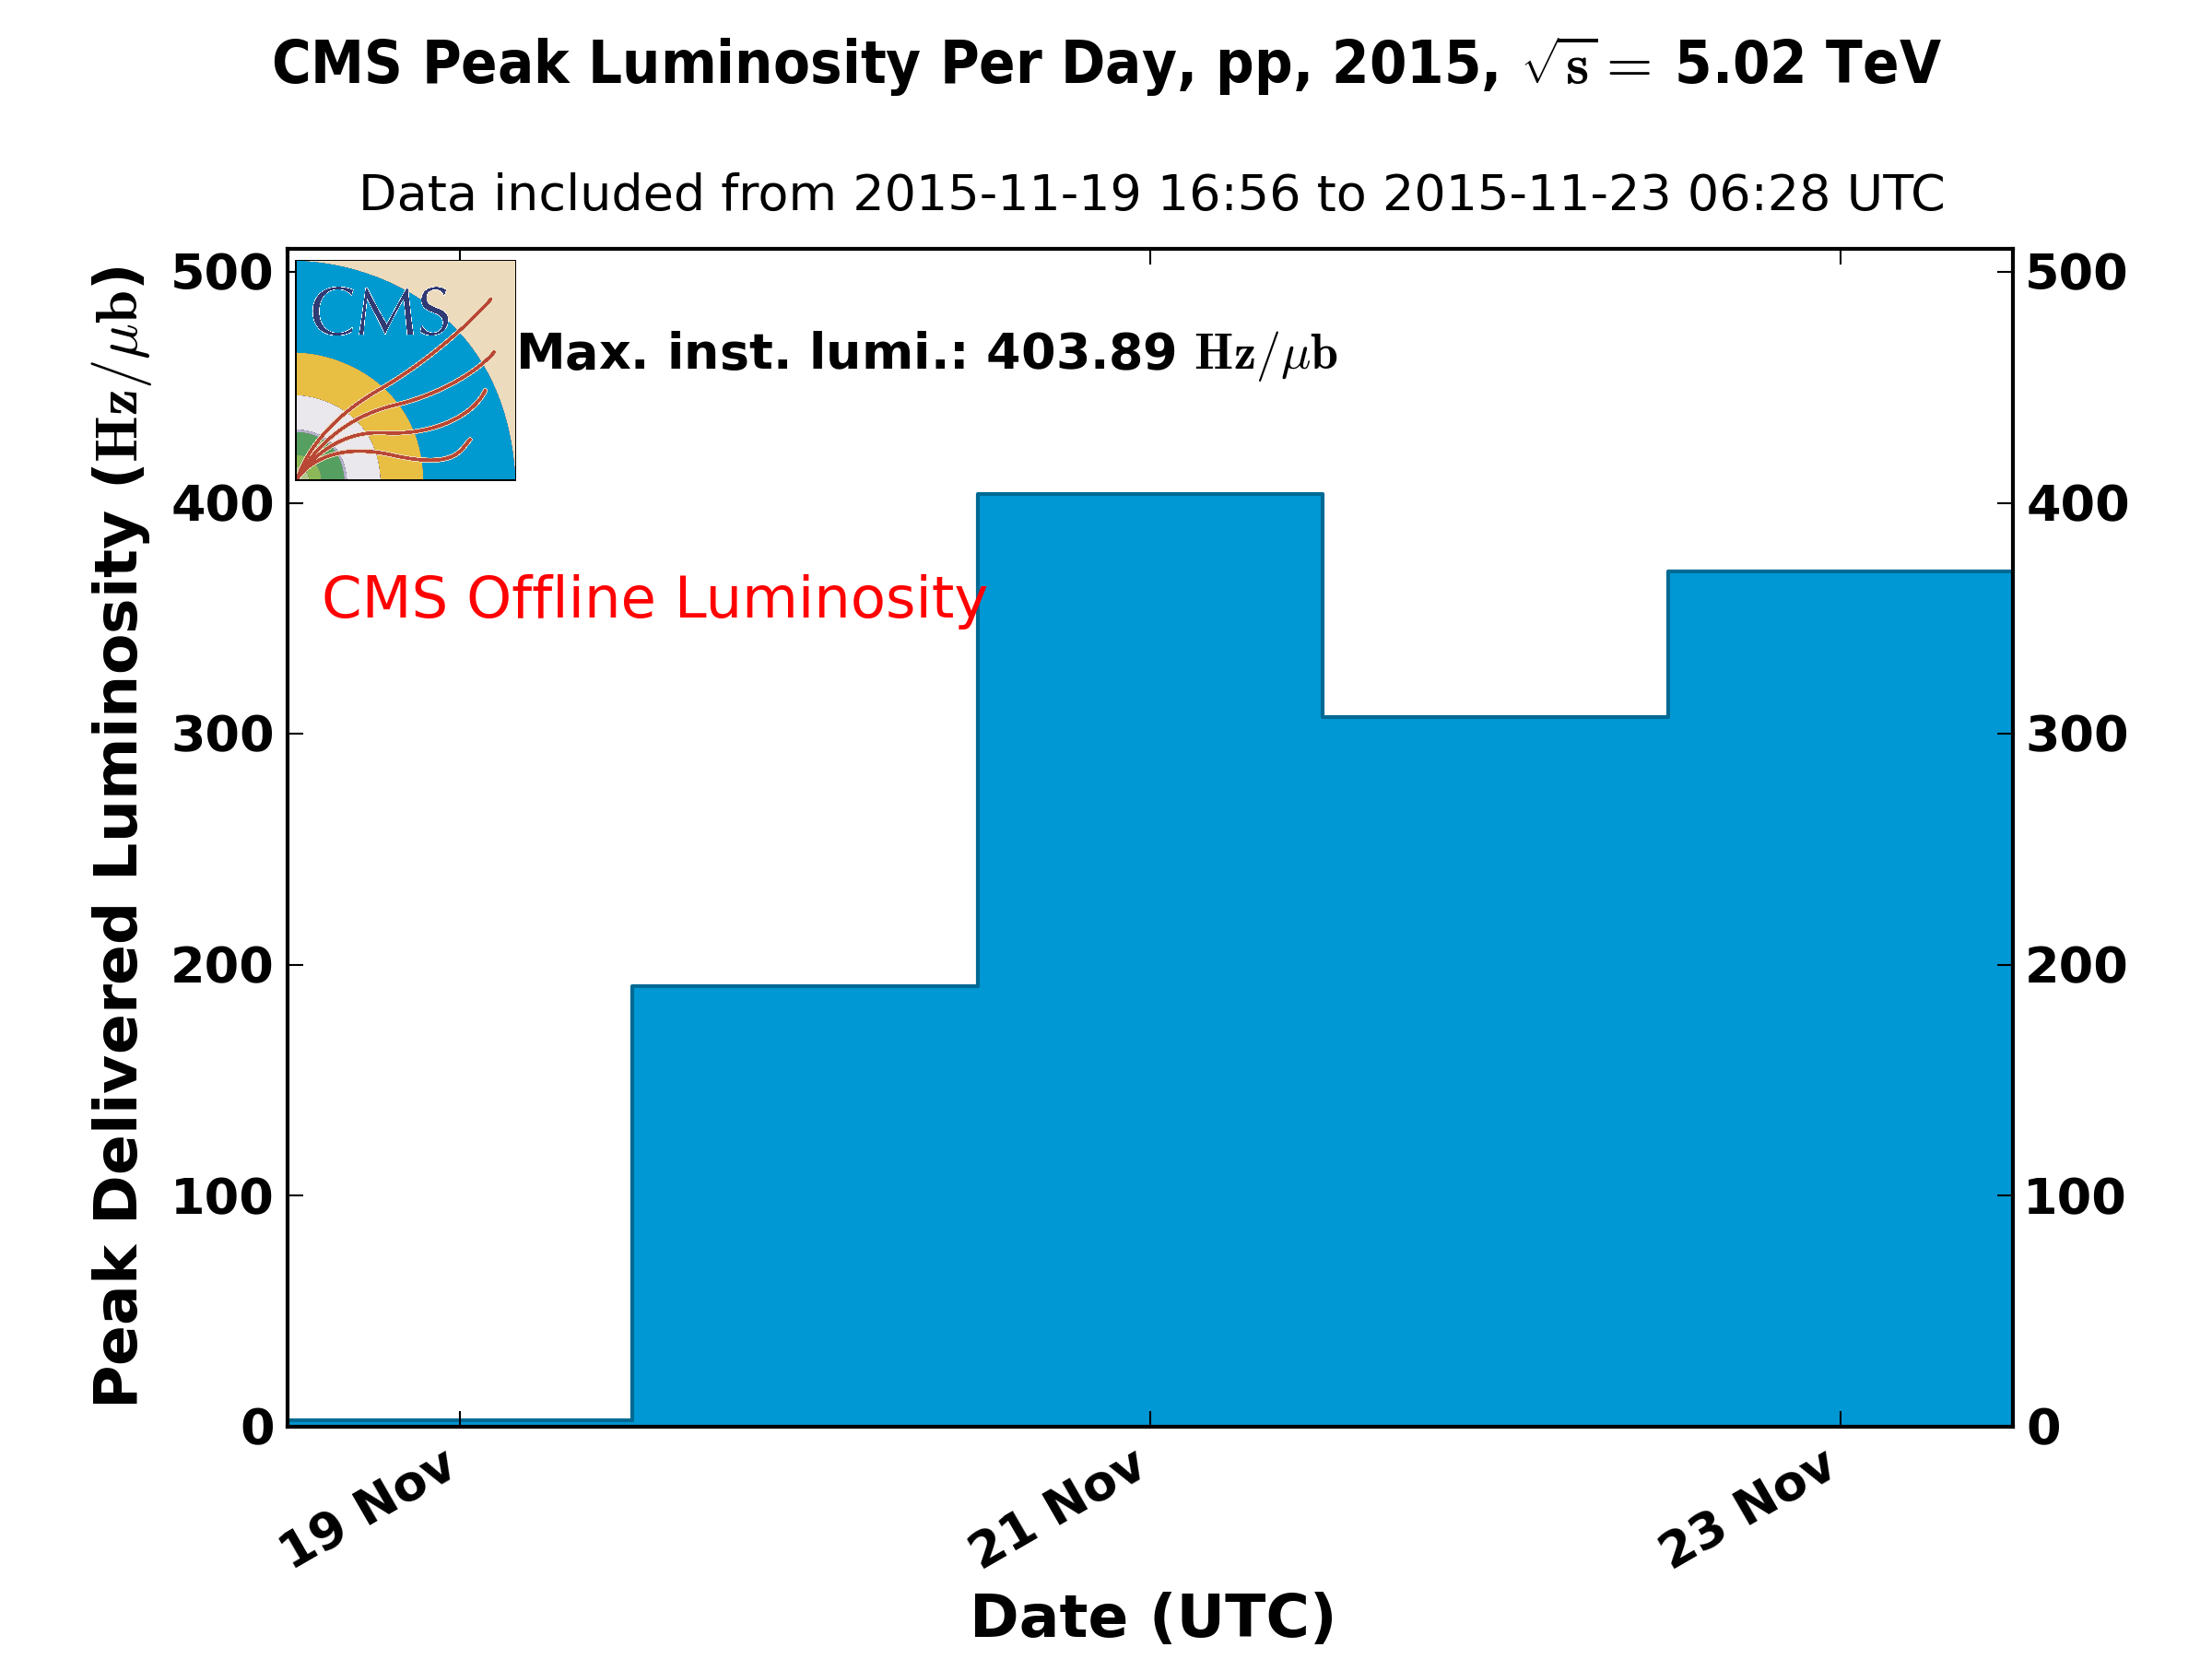 https://cern.ch/cmslumi/publicplots/peak_lumi_per_day_pp_2015_rr.png